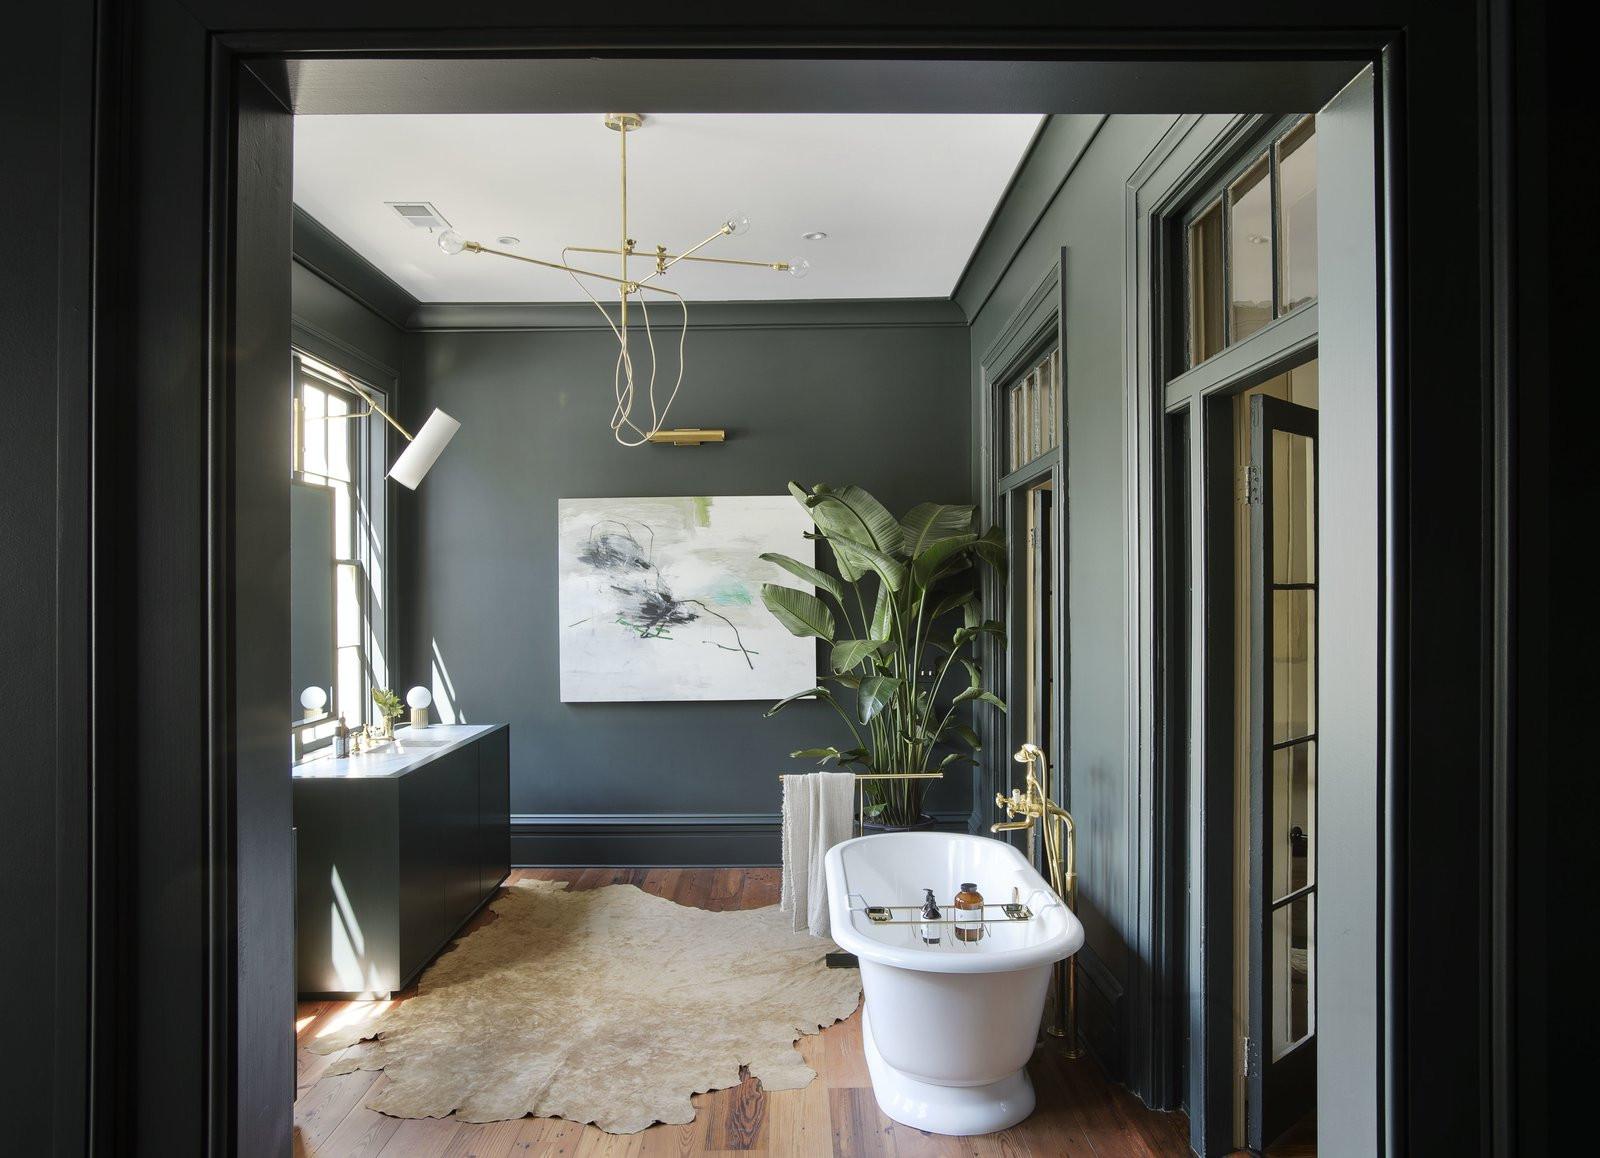 Contemporary Bathroom Design  9 Modern Bathroom Ideas That Go f the Beaten Path Dwell